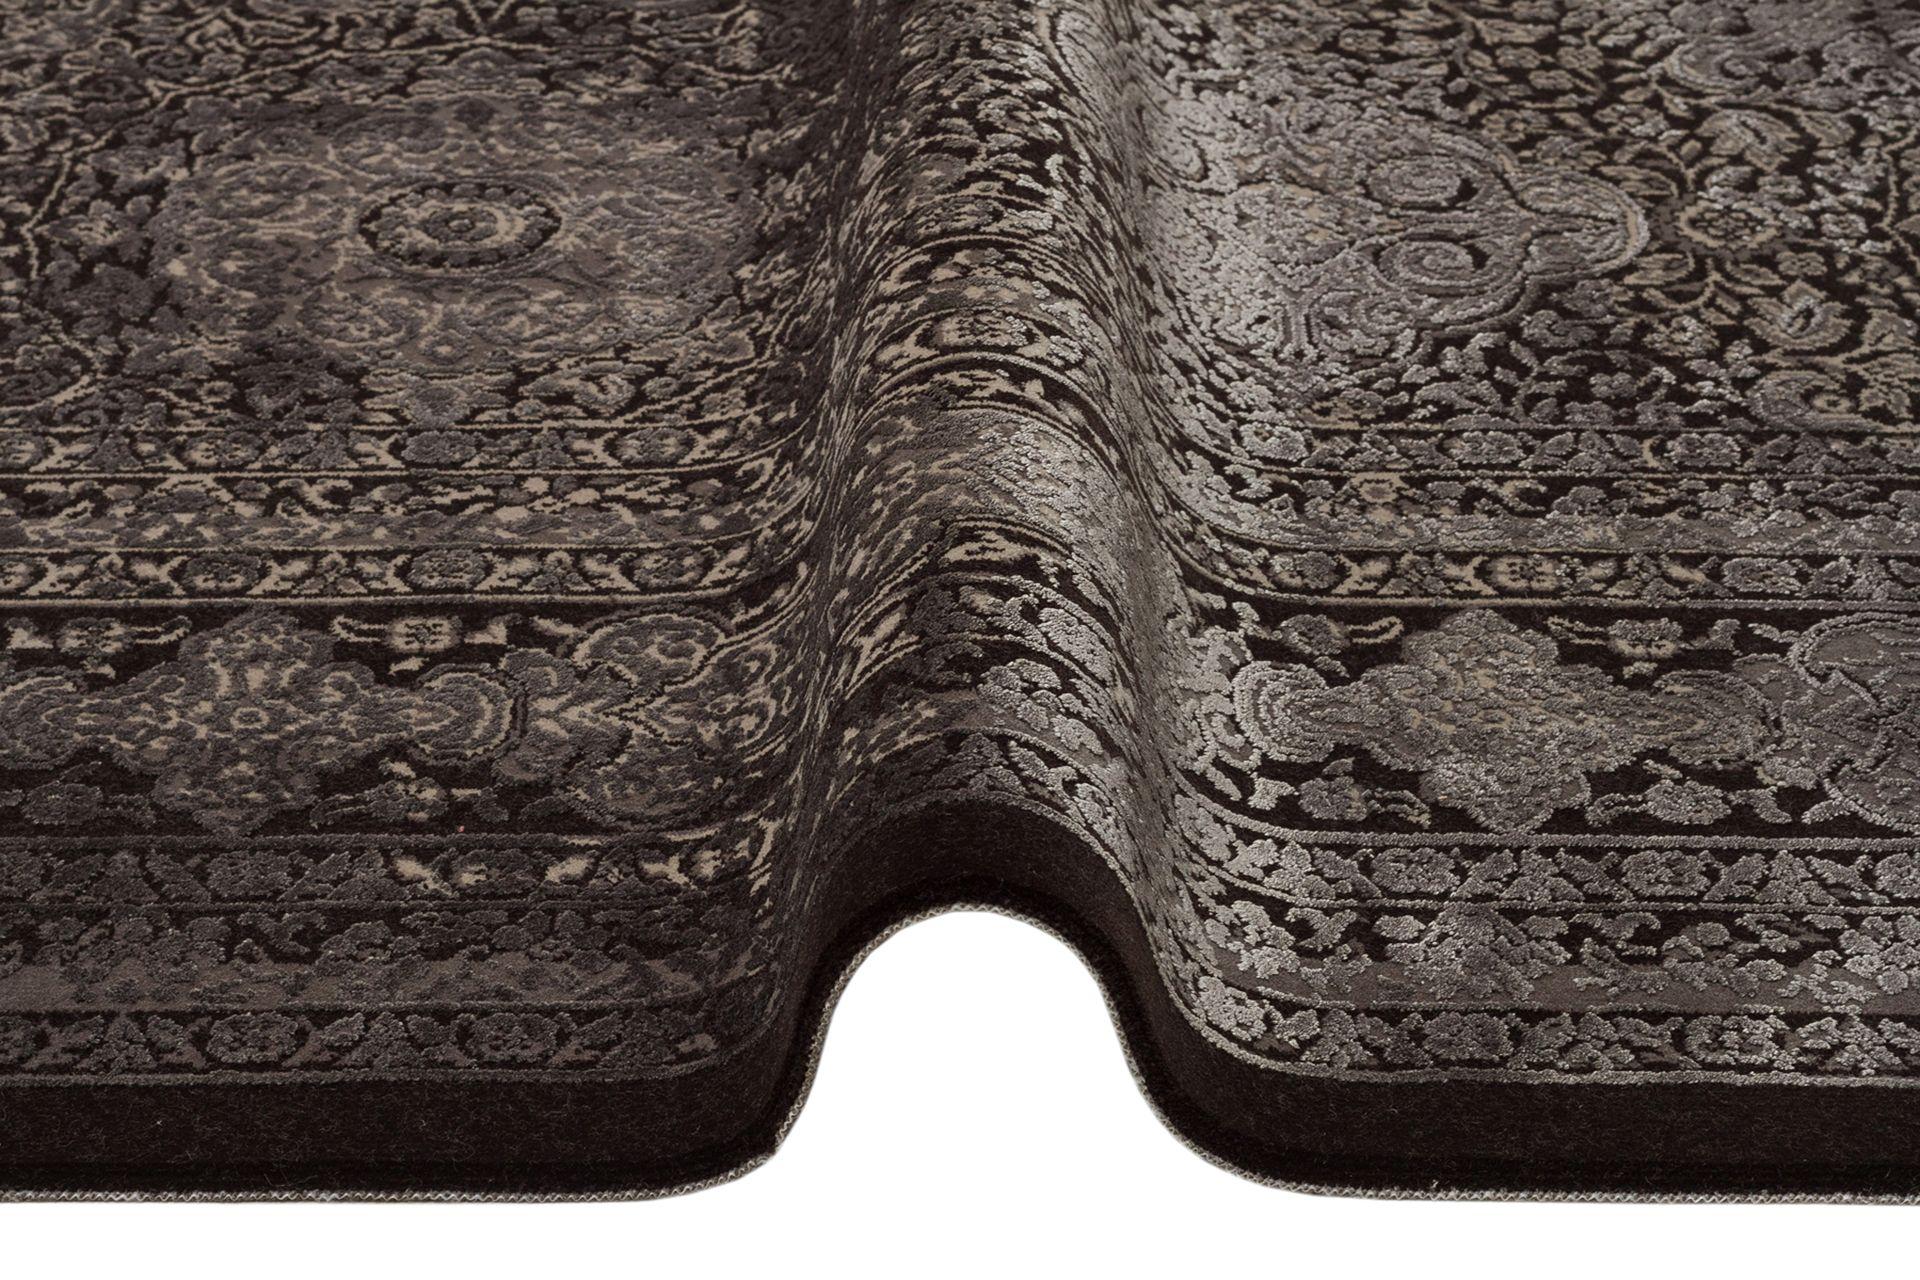 ANADOLU AD 02 ANTRASİT GRİ KLASİK DESENLİ SALON HALISI 130x190